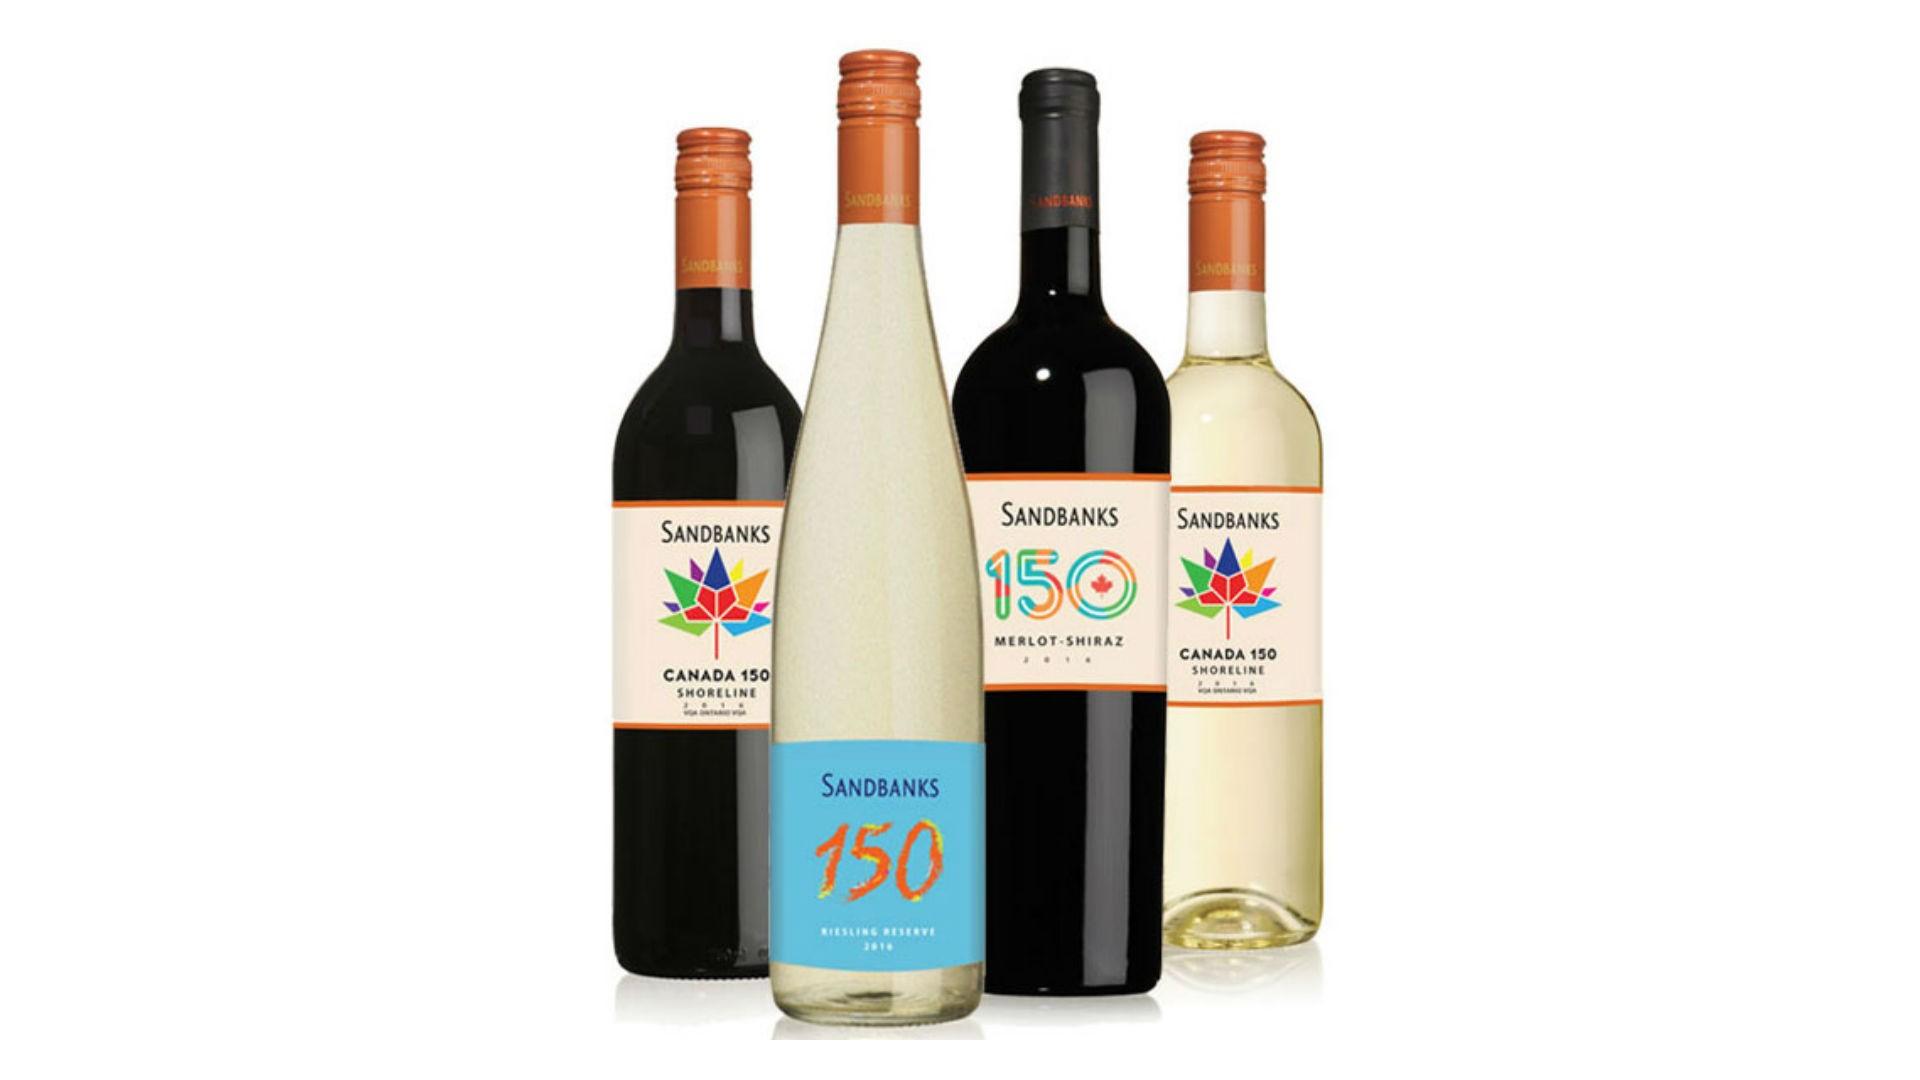 Sandbanks Canada 150 Wines